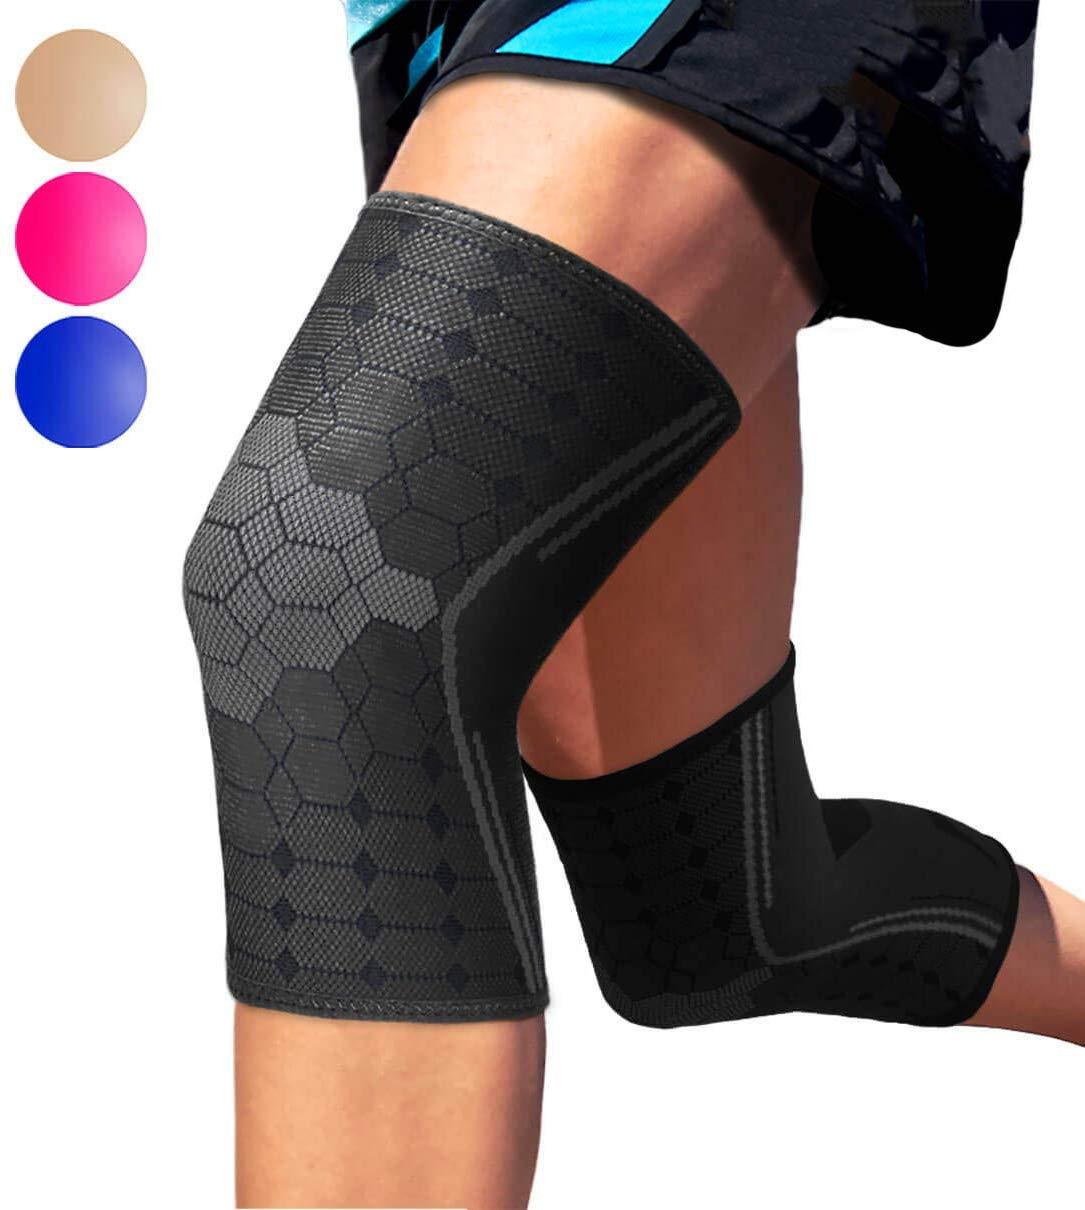 BERTER Knee Brace for Men Women - Compression Sleeve Non-Slip BERTER Knee Brace for Men Women - Compression Sleeve Non-Slip for Runningfor Running